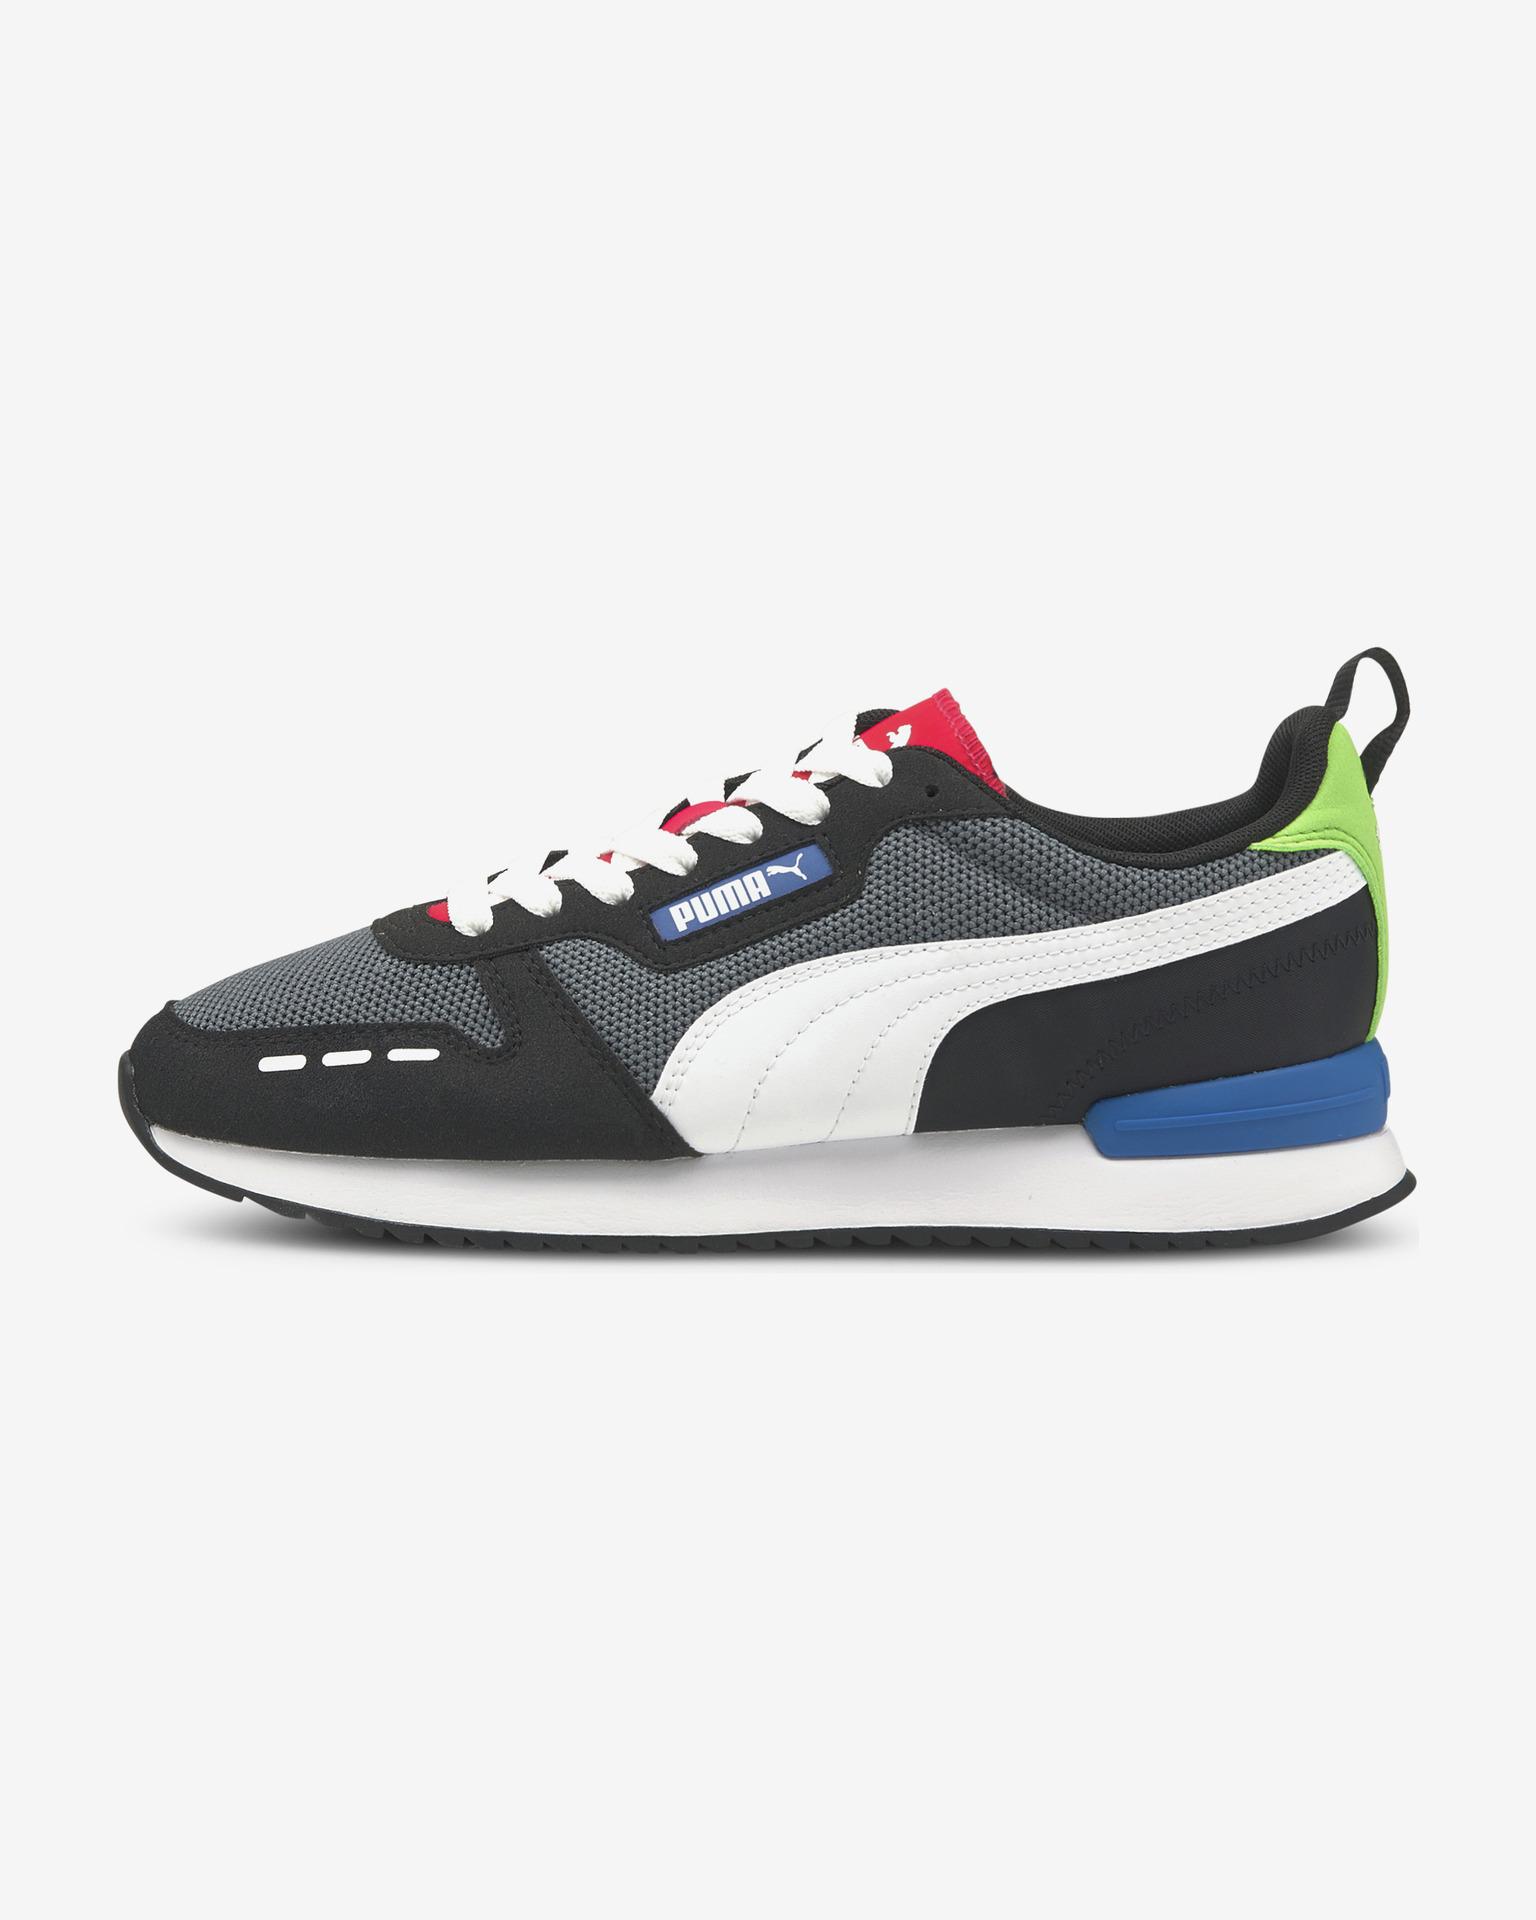 Puma - R78 Sneakers Bibloo.com